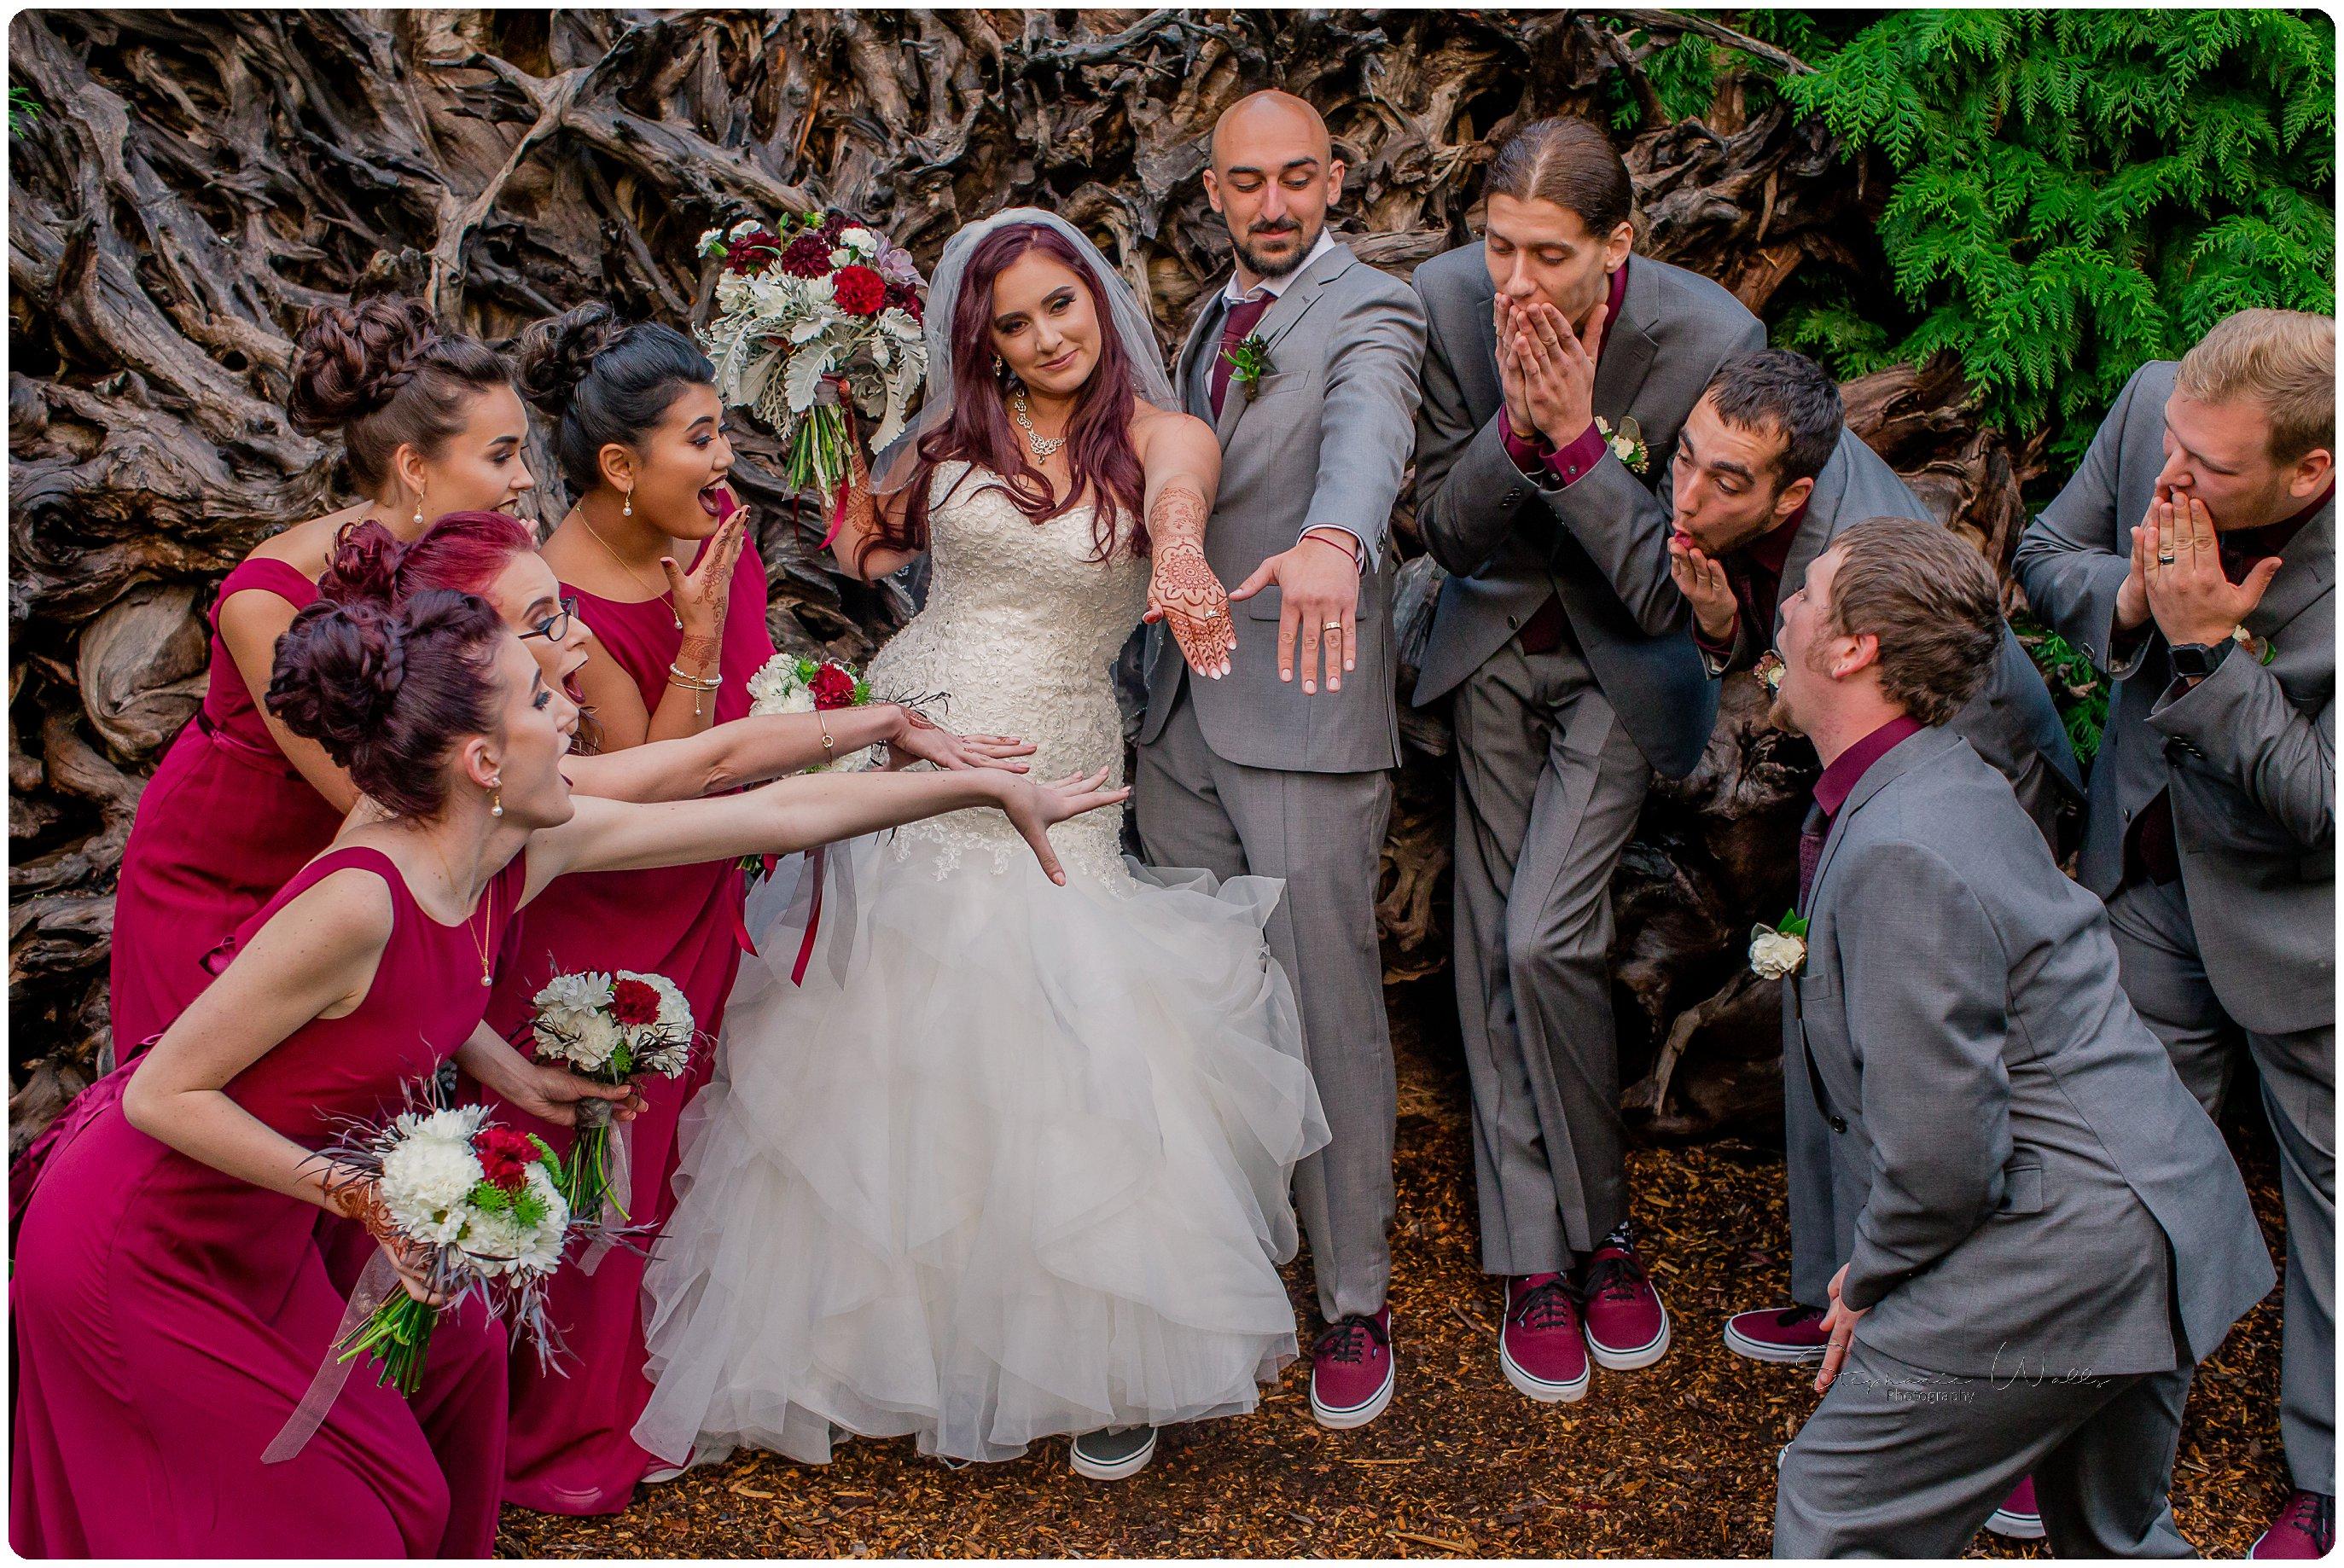 Wedding Party 037 Megan & Mo's Day 2   Willow Lodge Wedding   Woodinville, Wa Wedding Photographer